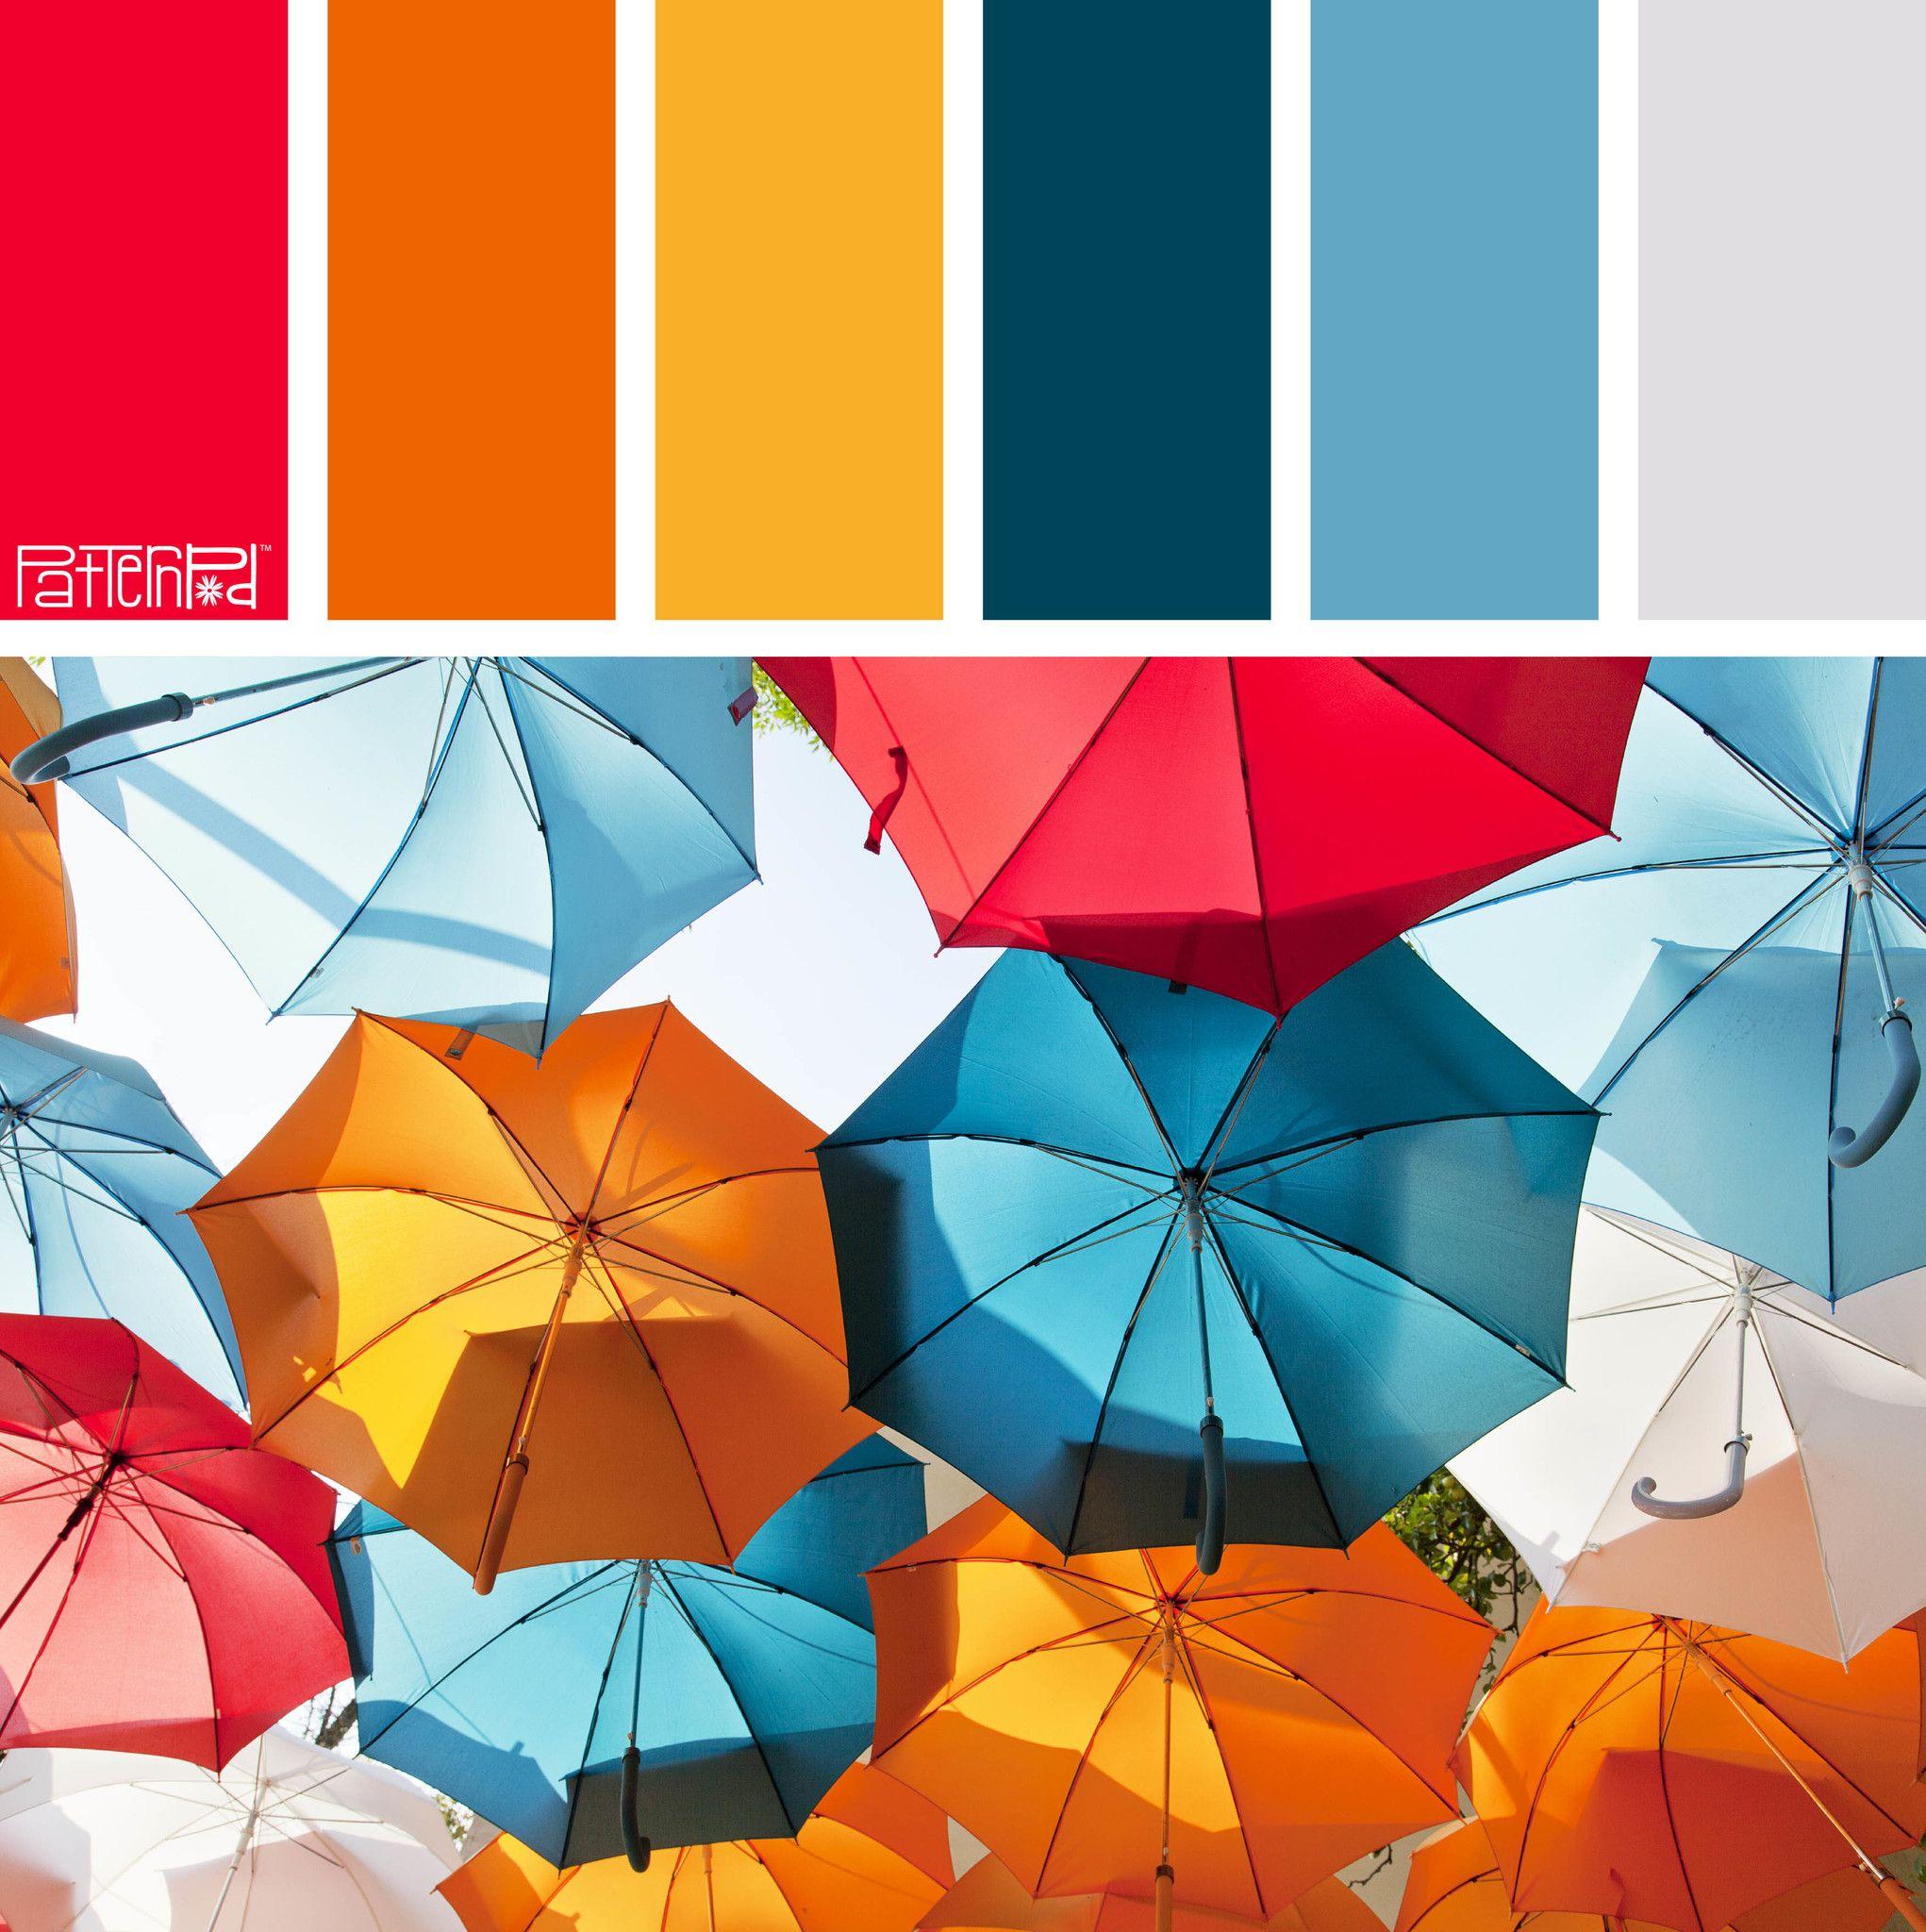 Paleta de colores  Paletas de colores  Pinterest  Paletas de colores Paletas y De colores